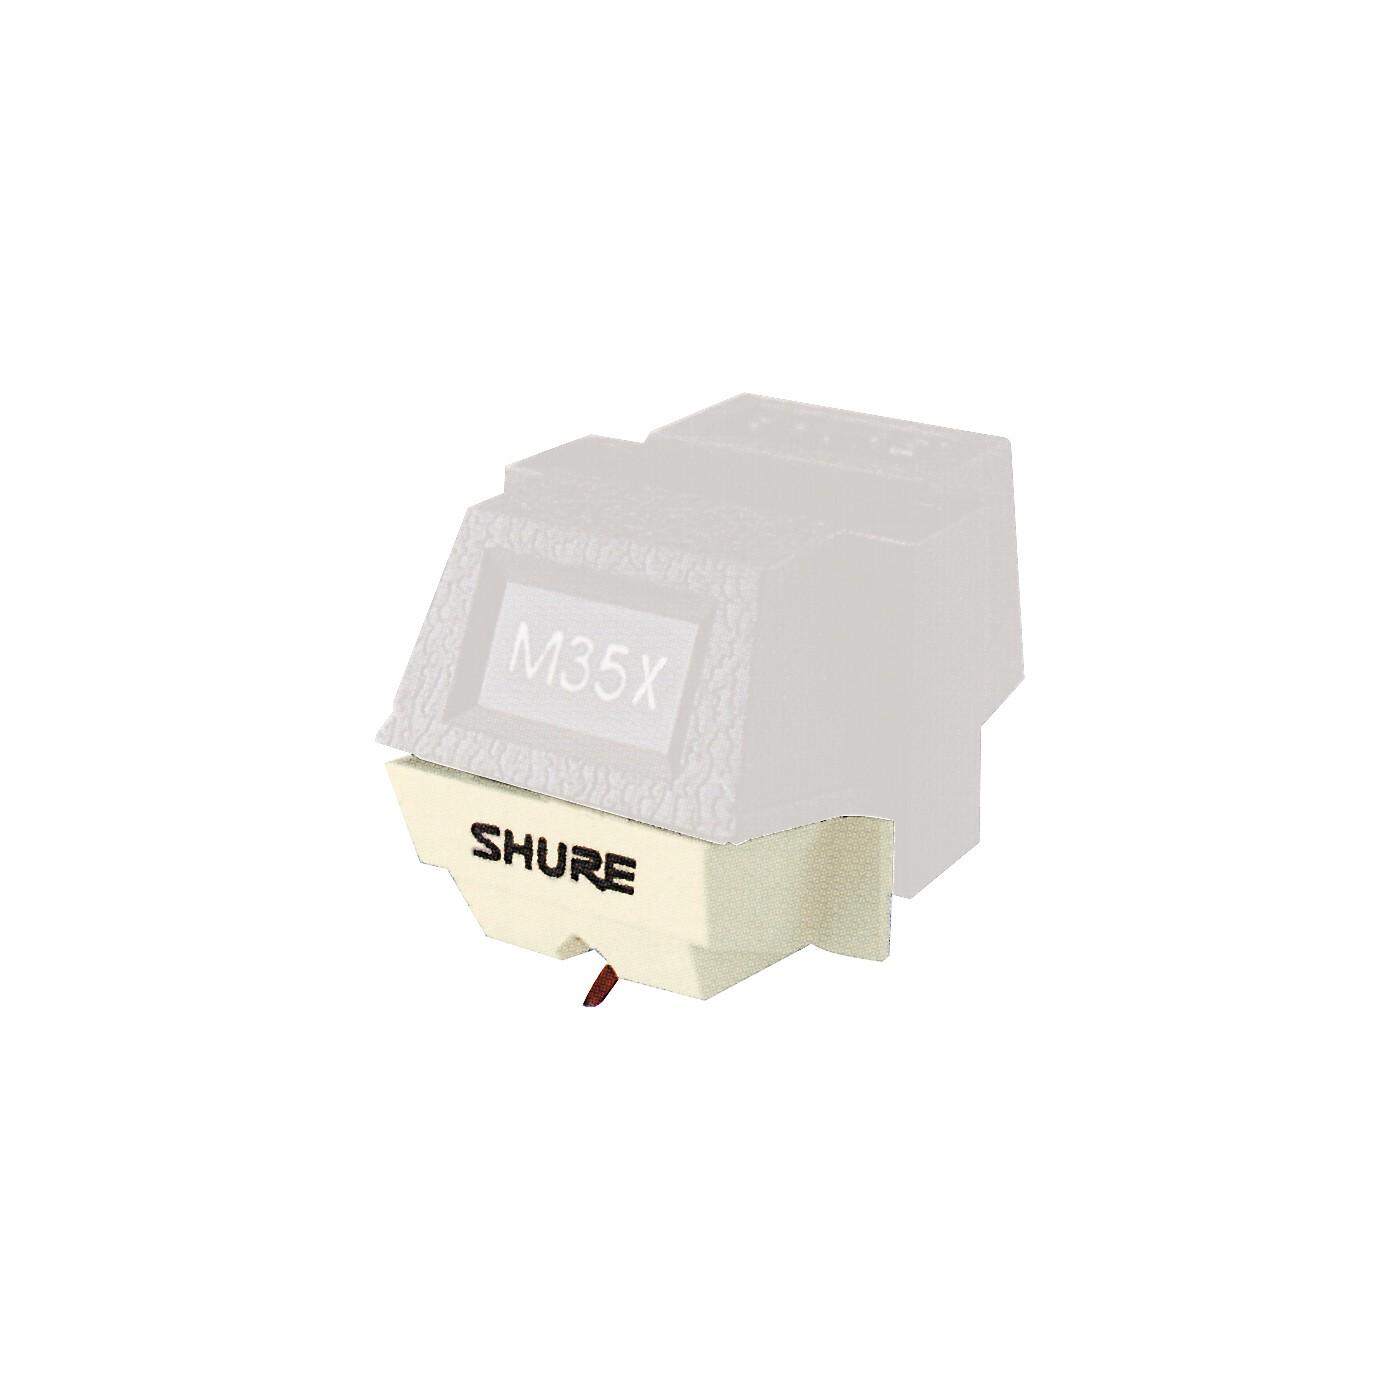 Shure N35X Stylus for M35X Cartridge thumbnail